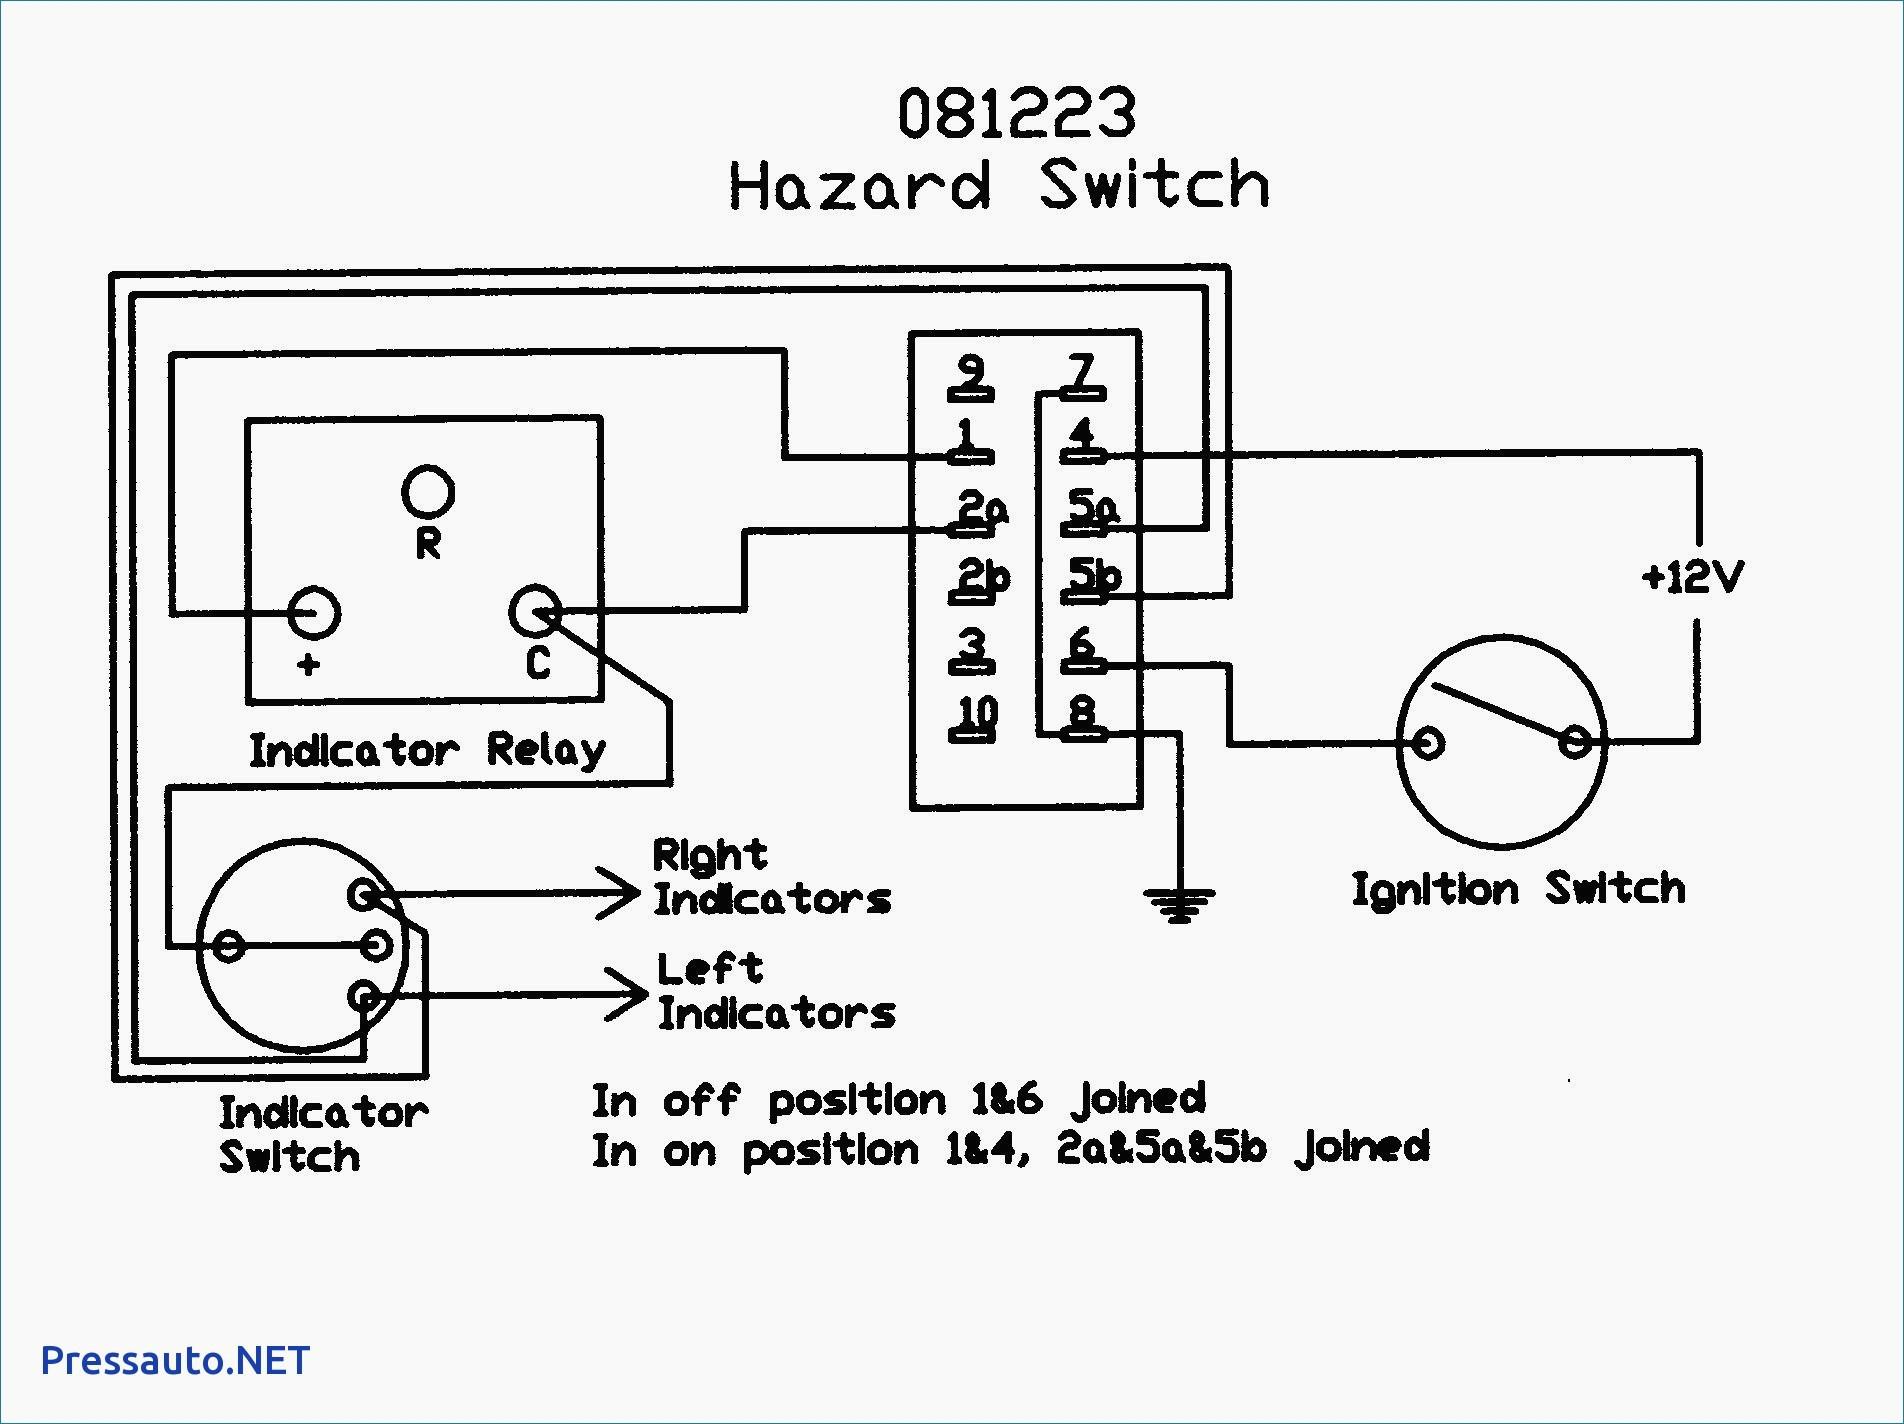 Wiring diagram champion winch wiring diagram write costumer to controller wiring diagram switch wiring diagram champion wiring library warn winch switch wiring champion winch wiring diagram wiring solutions